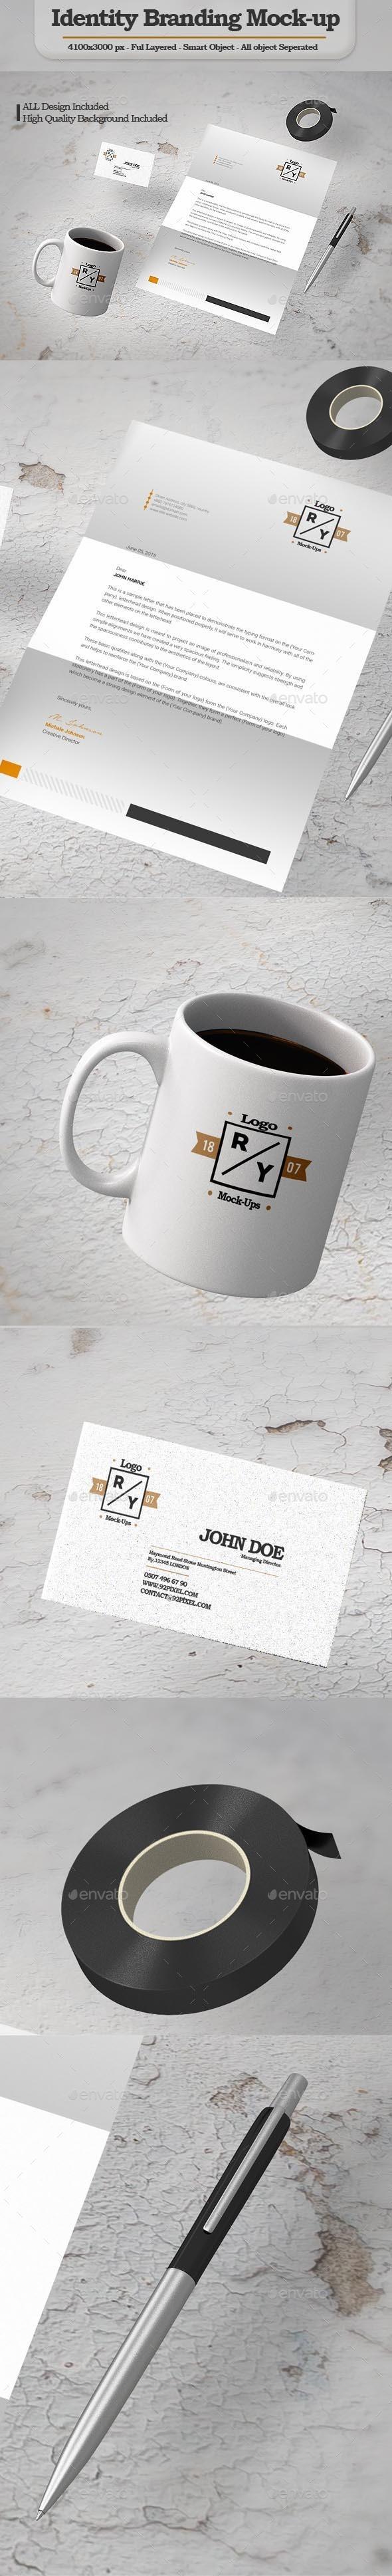 Identity Branding Mock-Up - Stationery Print